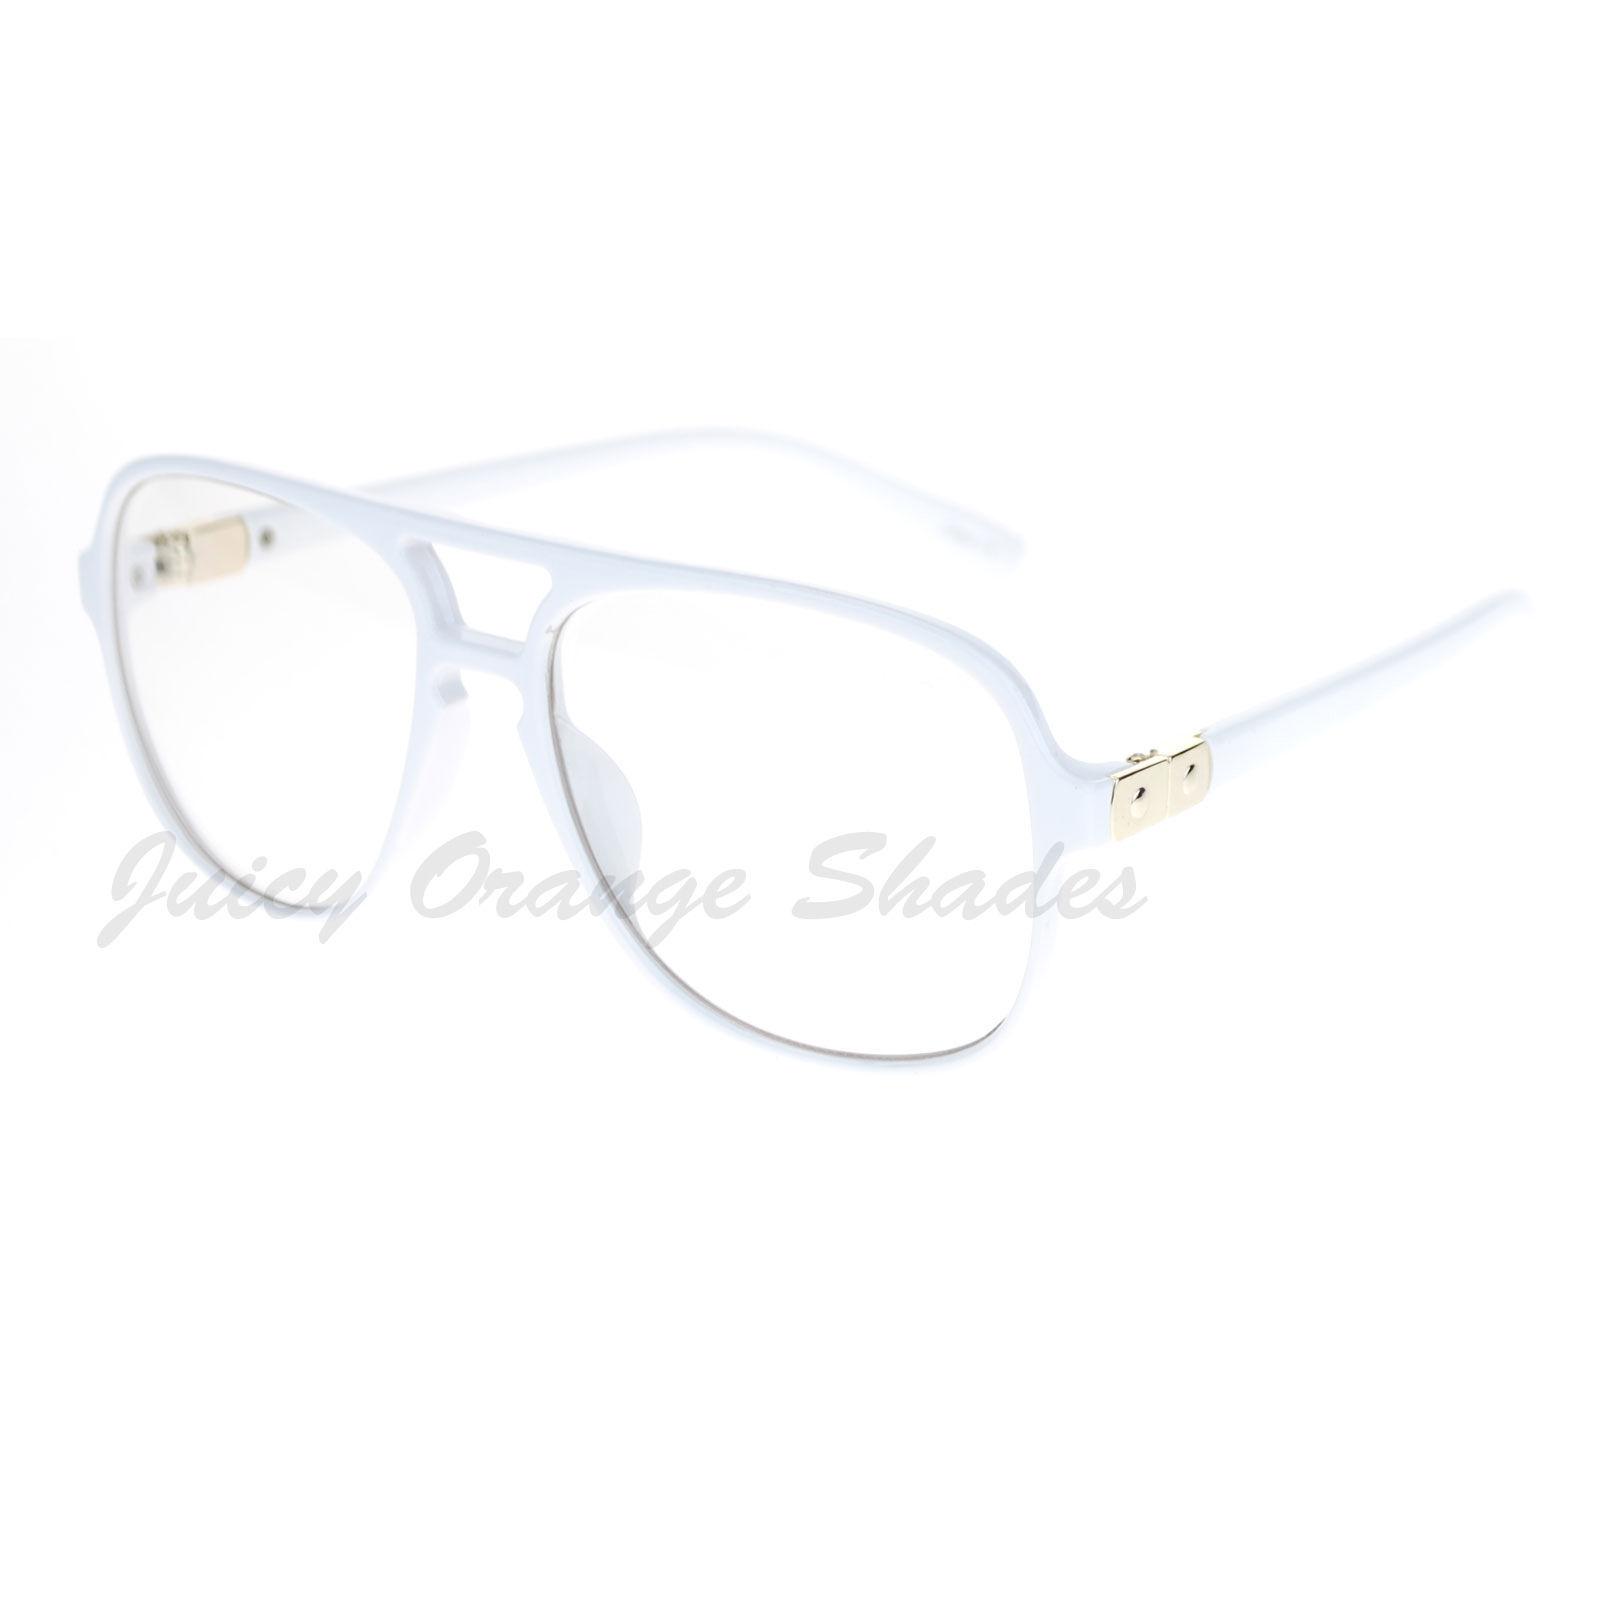 Nerdy Clear Lens Fashion Eyeglasses Oversize Square Glasses